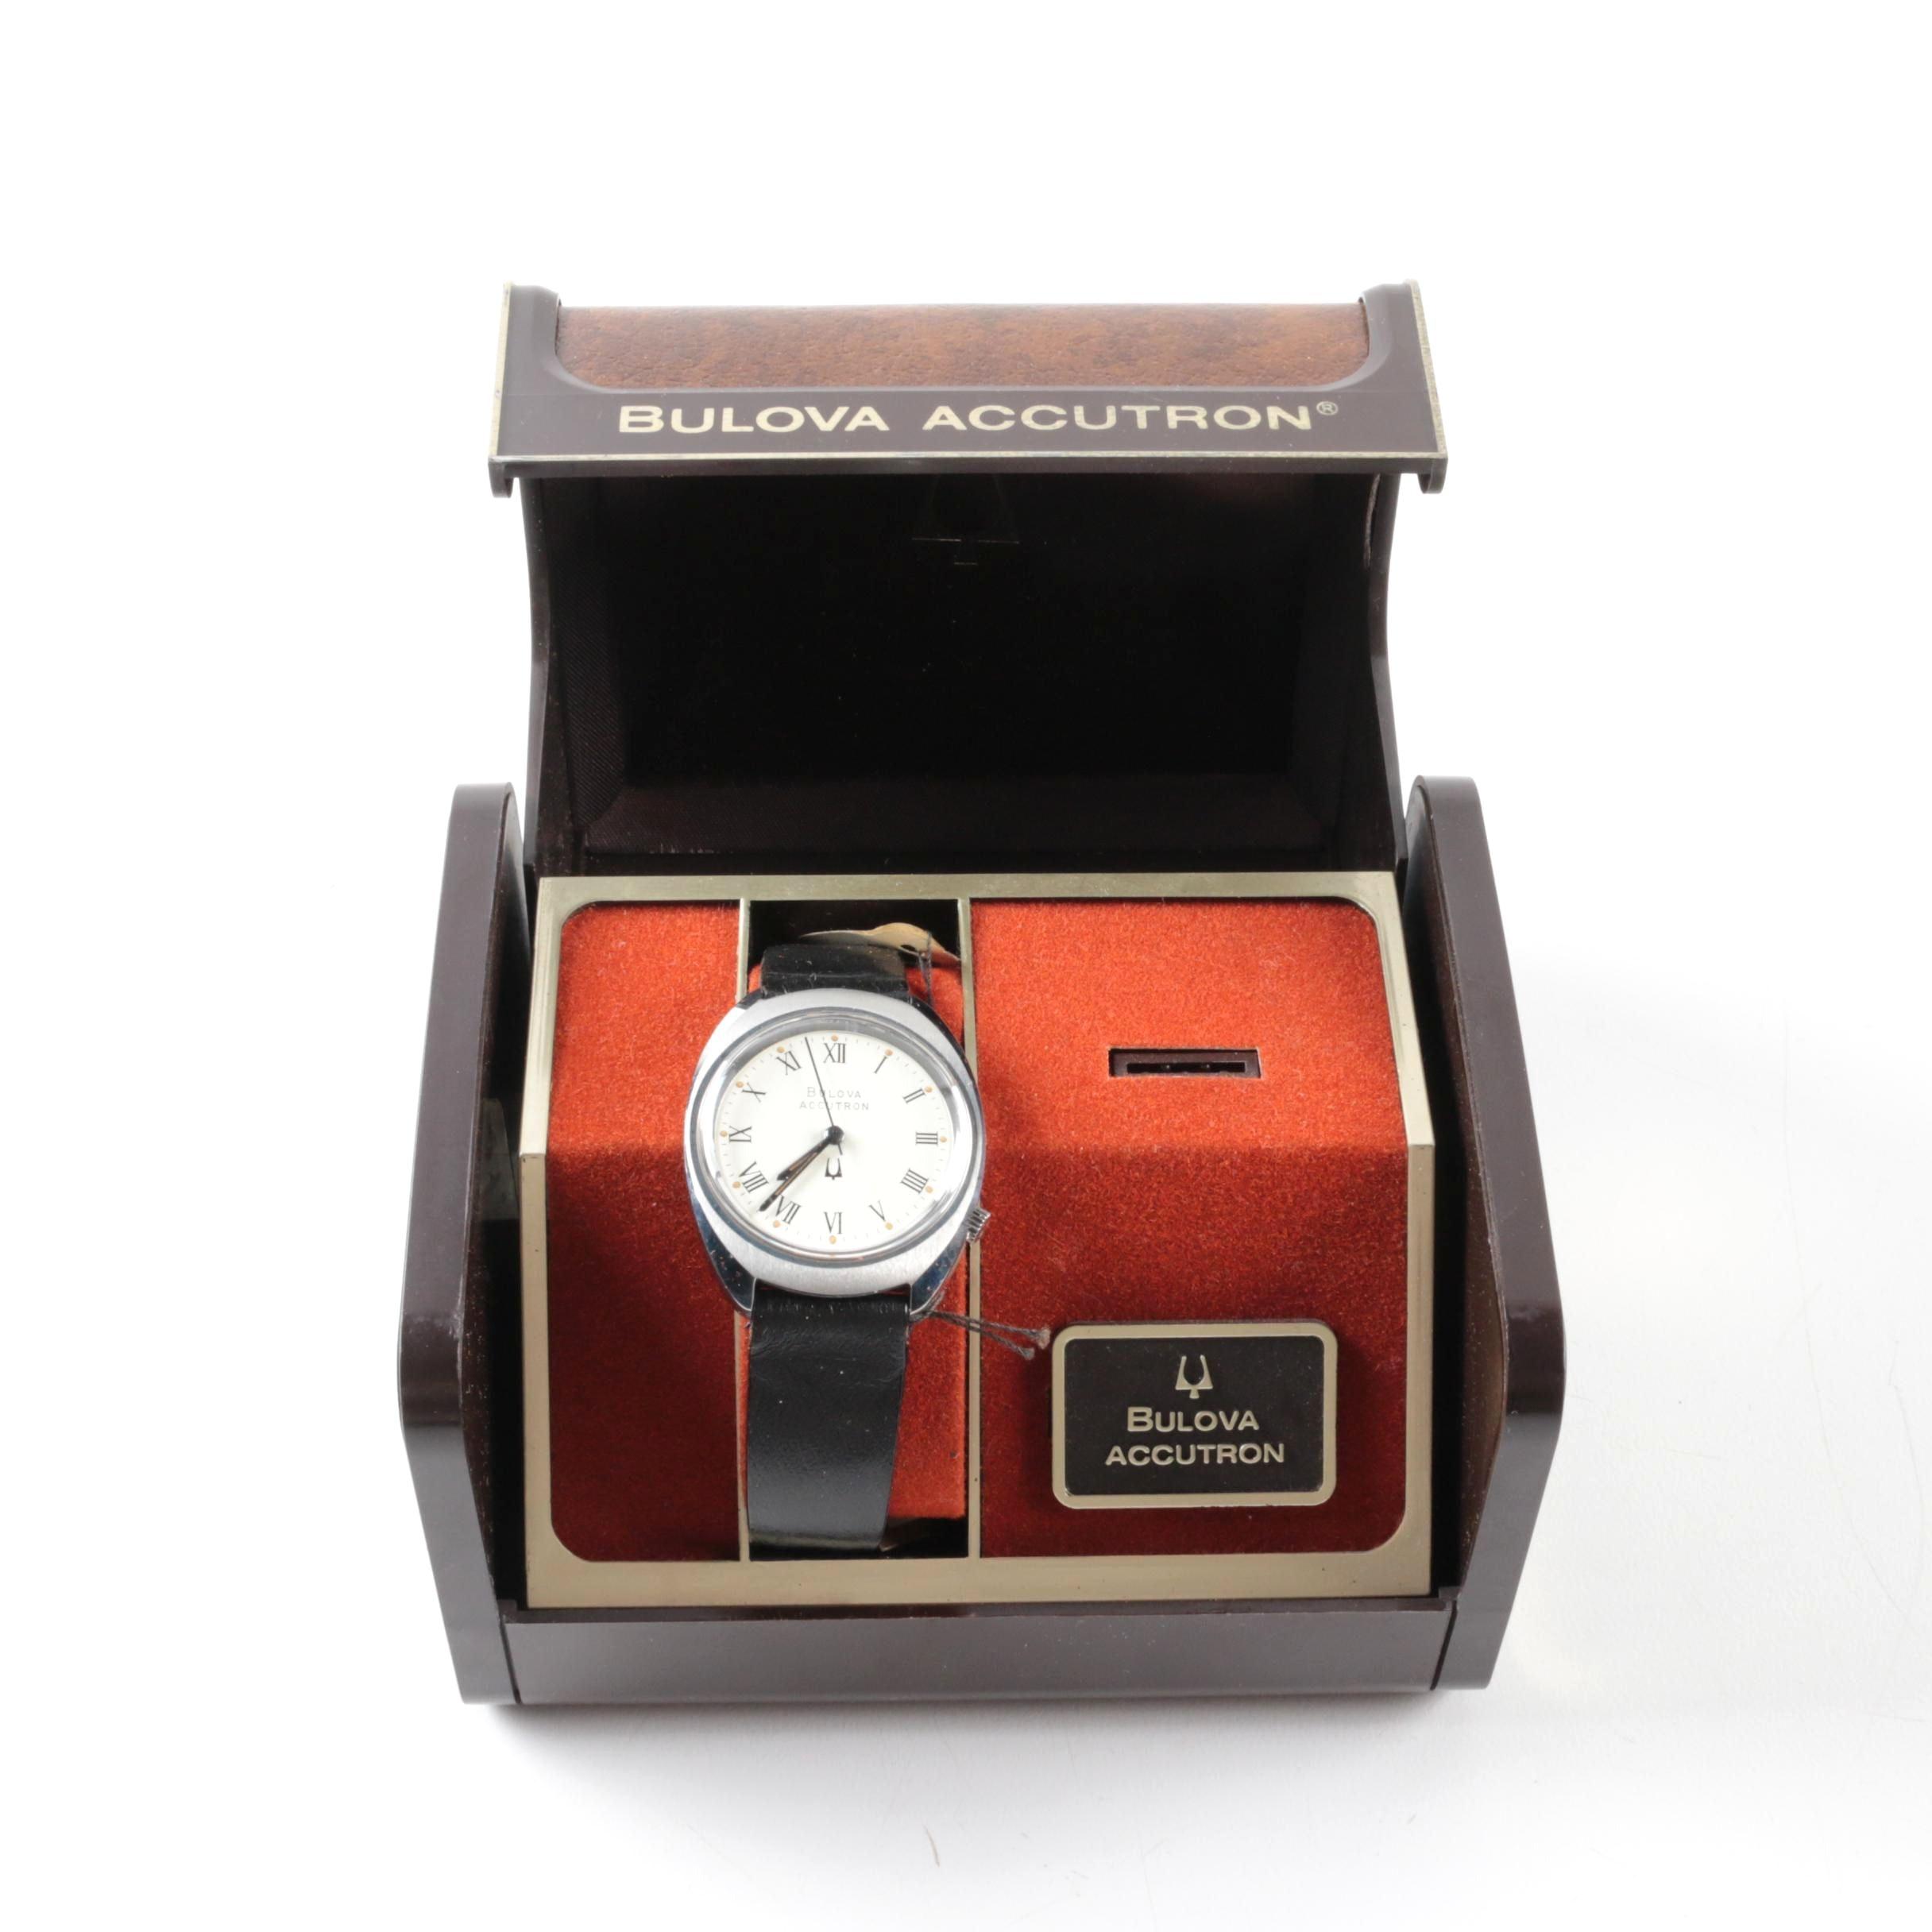 Vintage Bulova Accutron Watch for Men